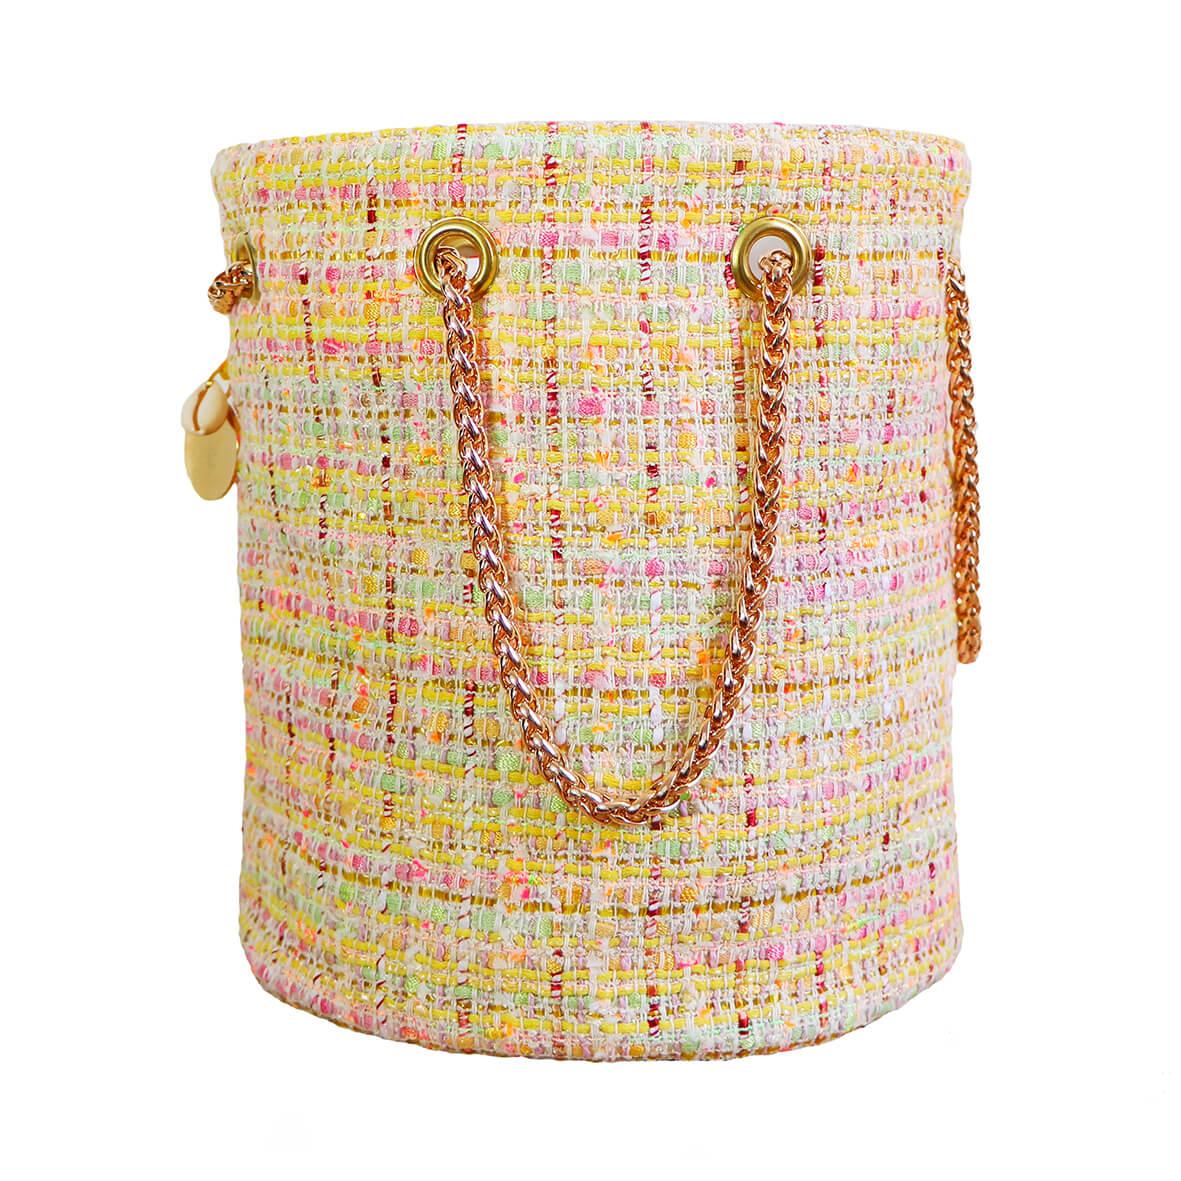 sac seau en tweed et cuir - sac rond mode femme fait en France - Chloé - Cénélia